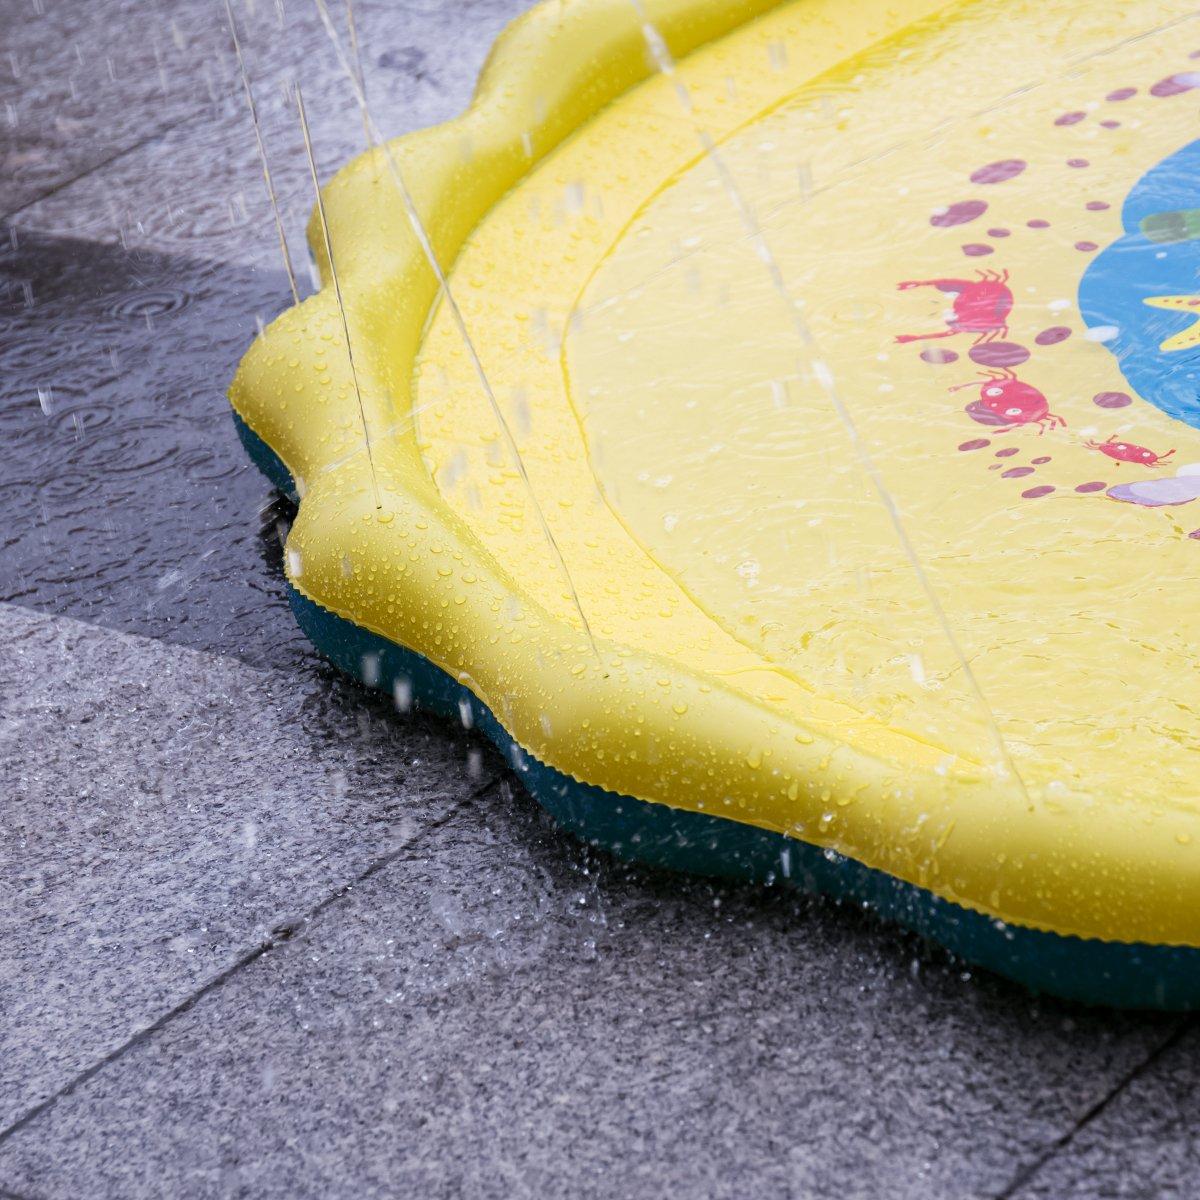 HALOFUN 67in-Diameter Sprinkle and Splash Play Mat for Kids (Yellow) by HALOFUN (Image #5)